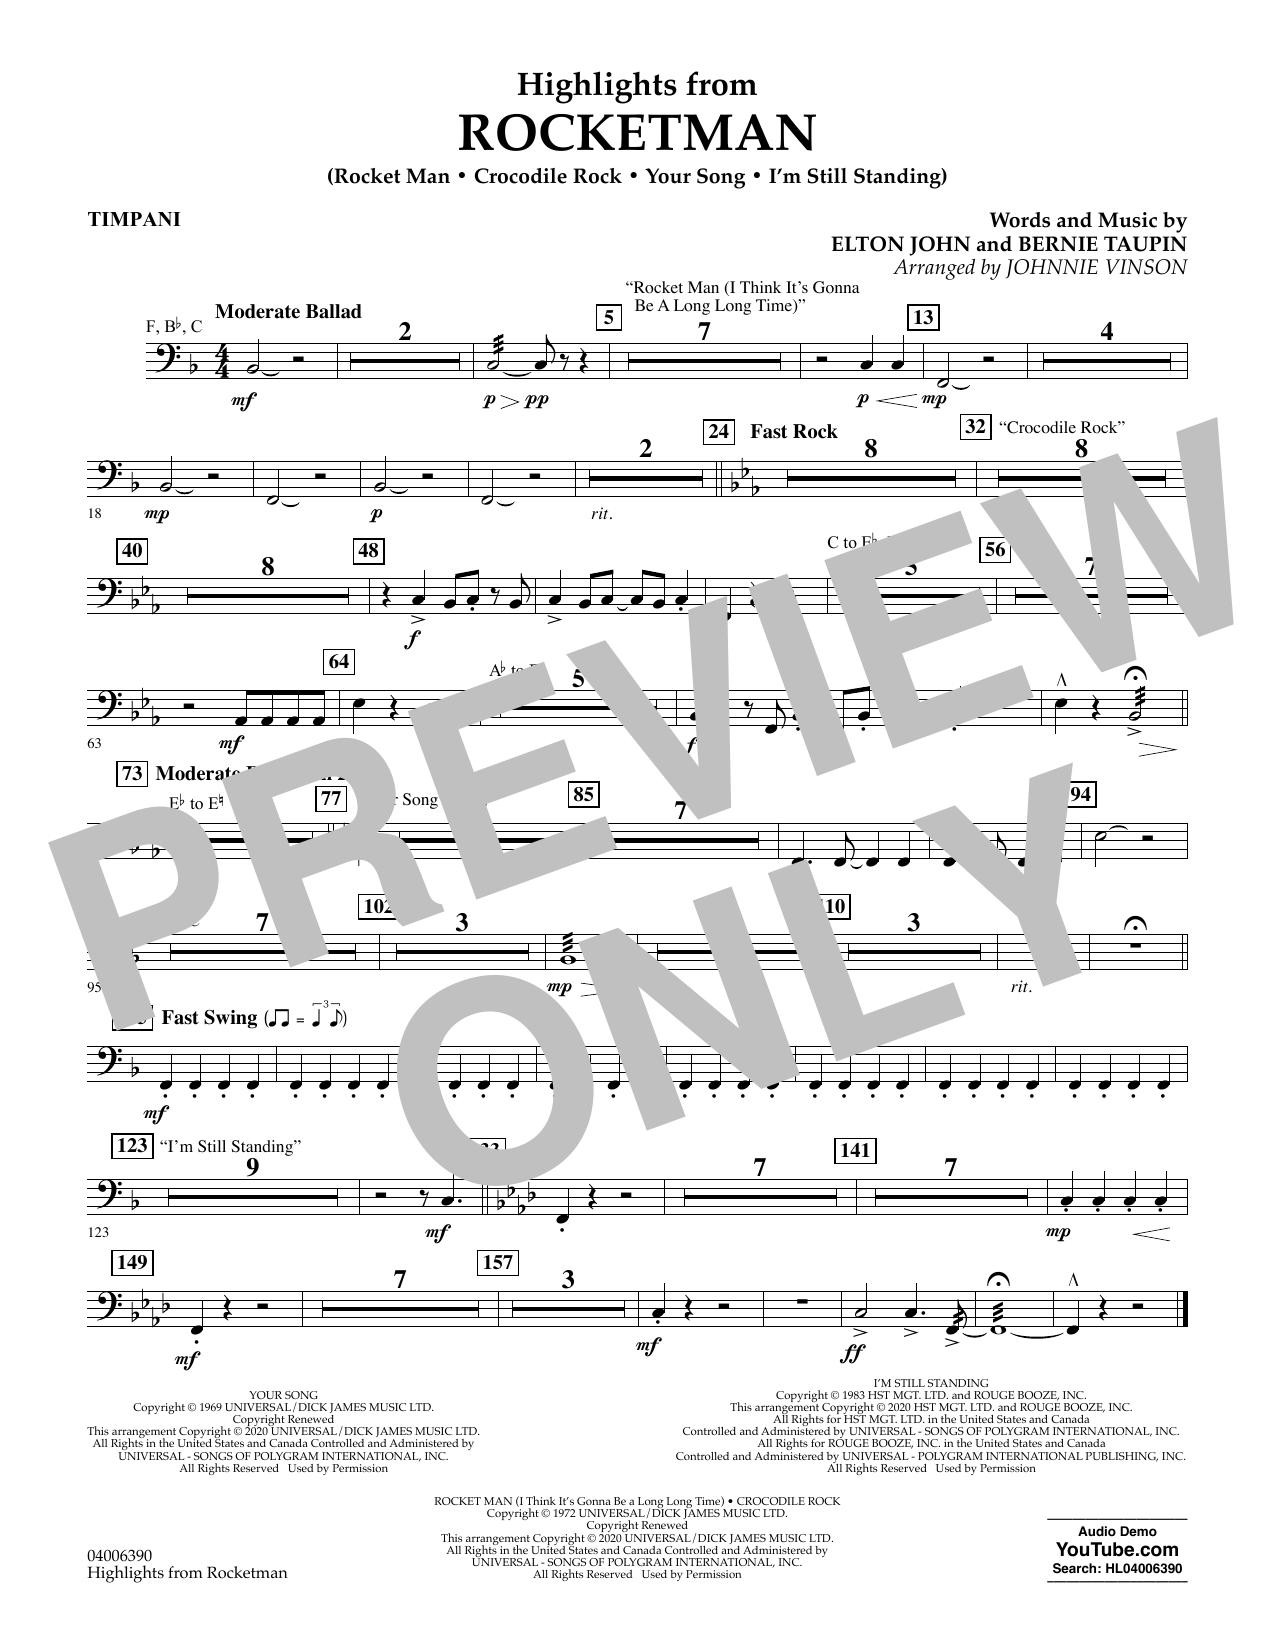 Highlights from Rocketman (arr. Johnnie Vinson) - Timpani (Flex-Band)